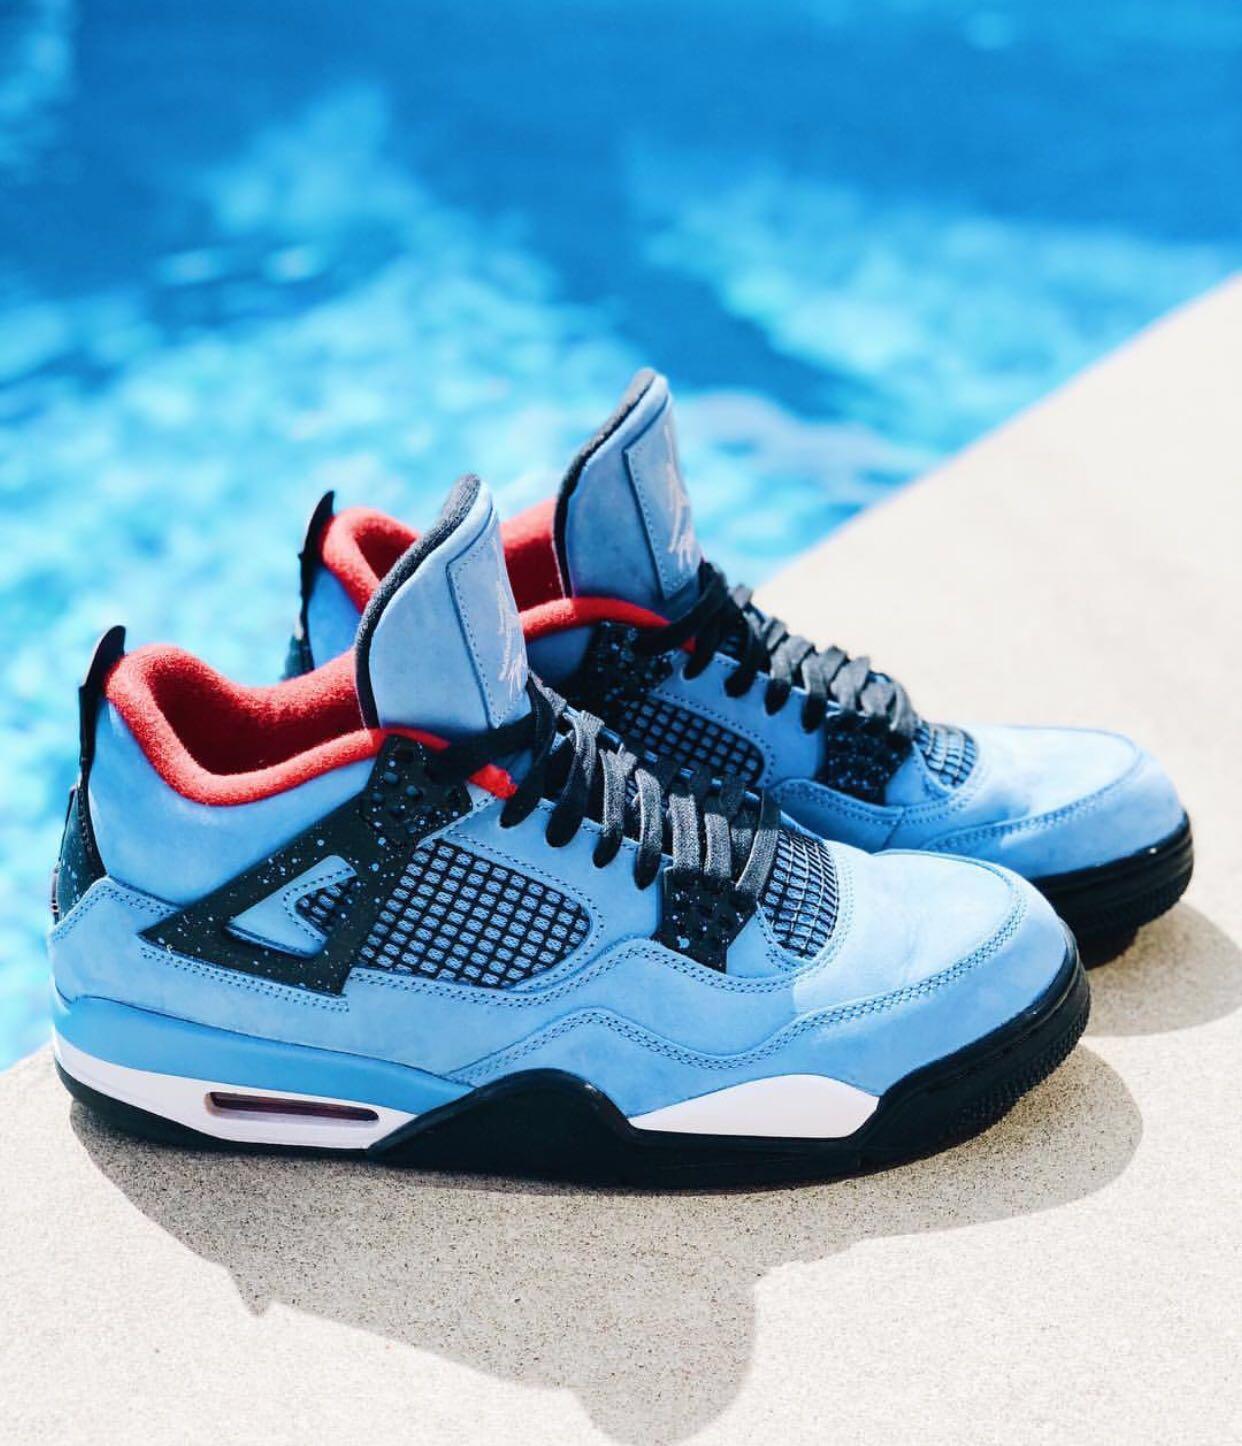 low priced e4611 59e5e Nike Air Jordan 4 Retro x Travis Scott Cactus Jack, Men's ...